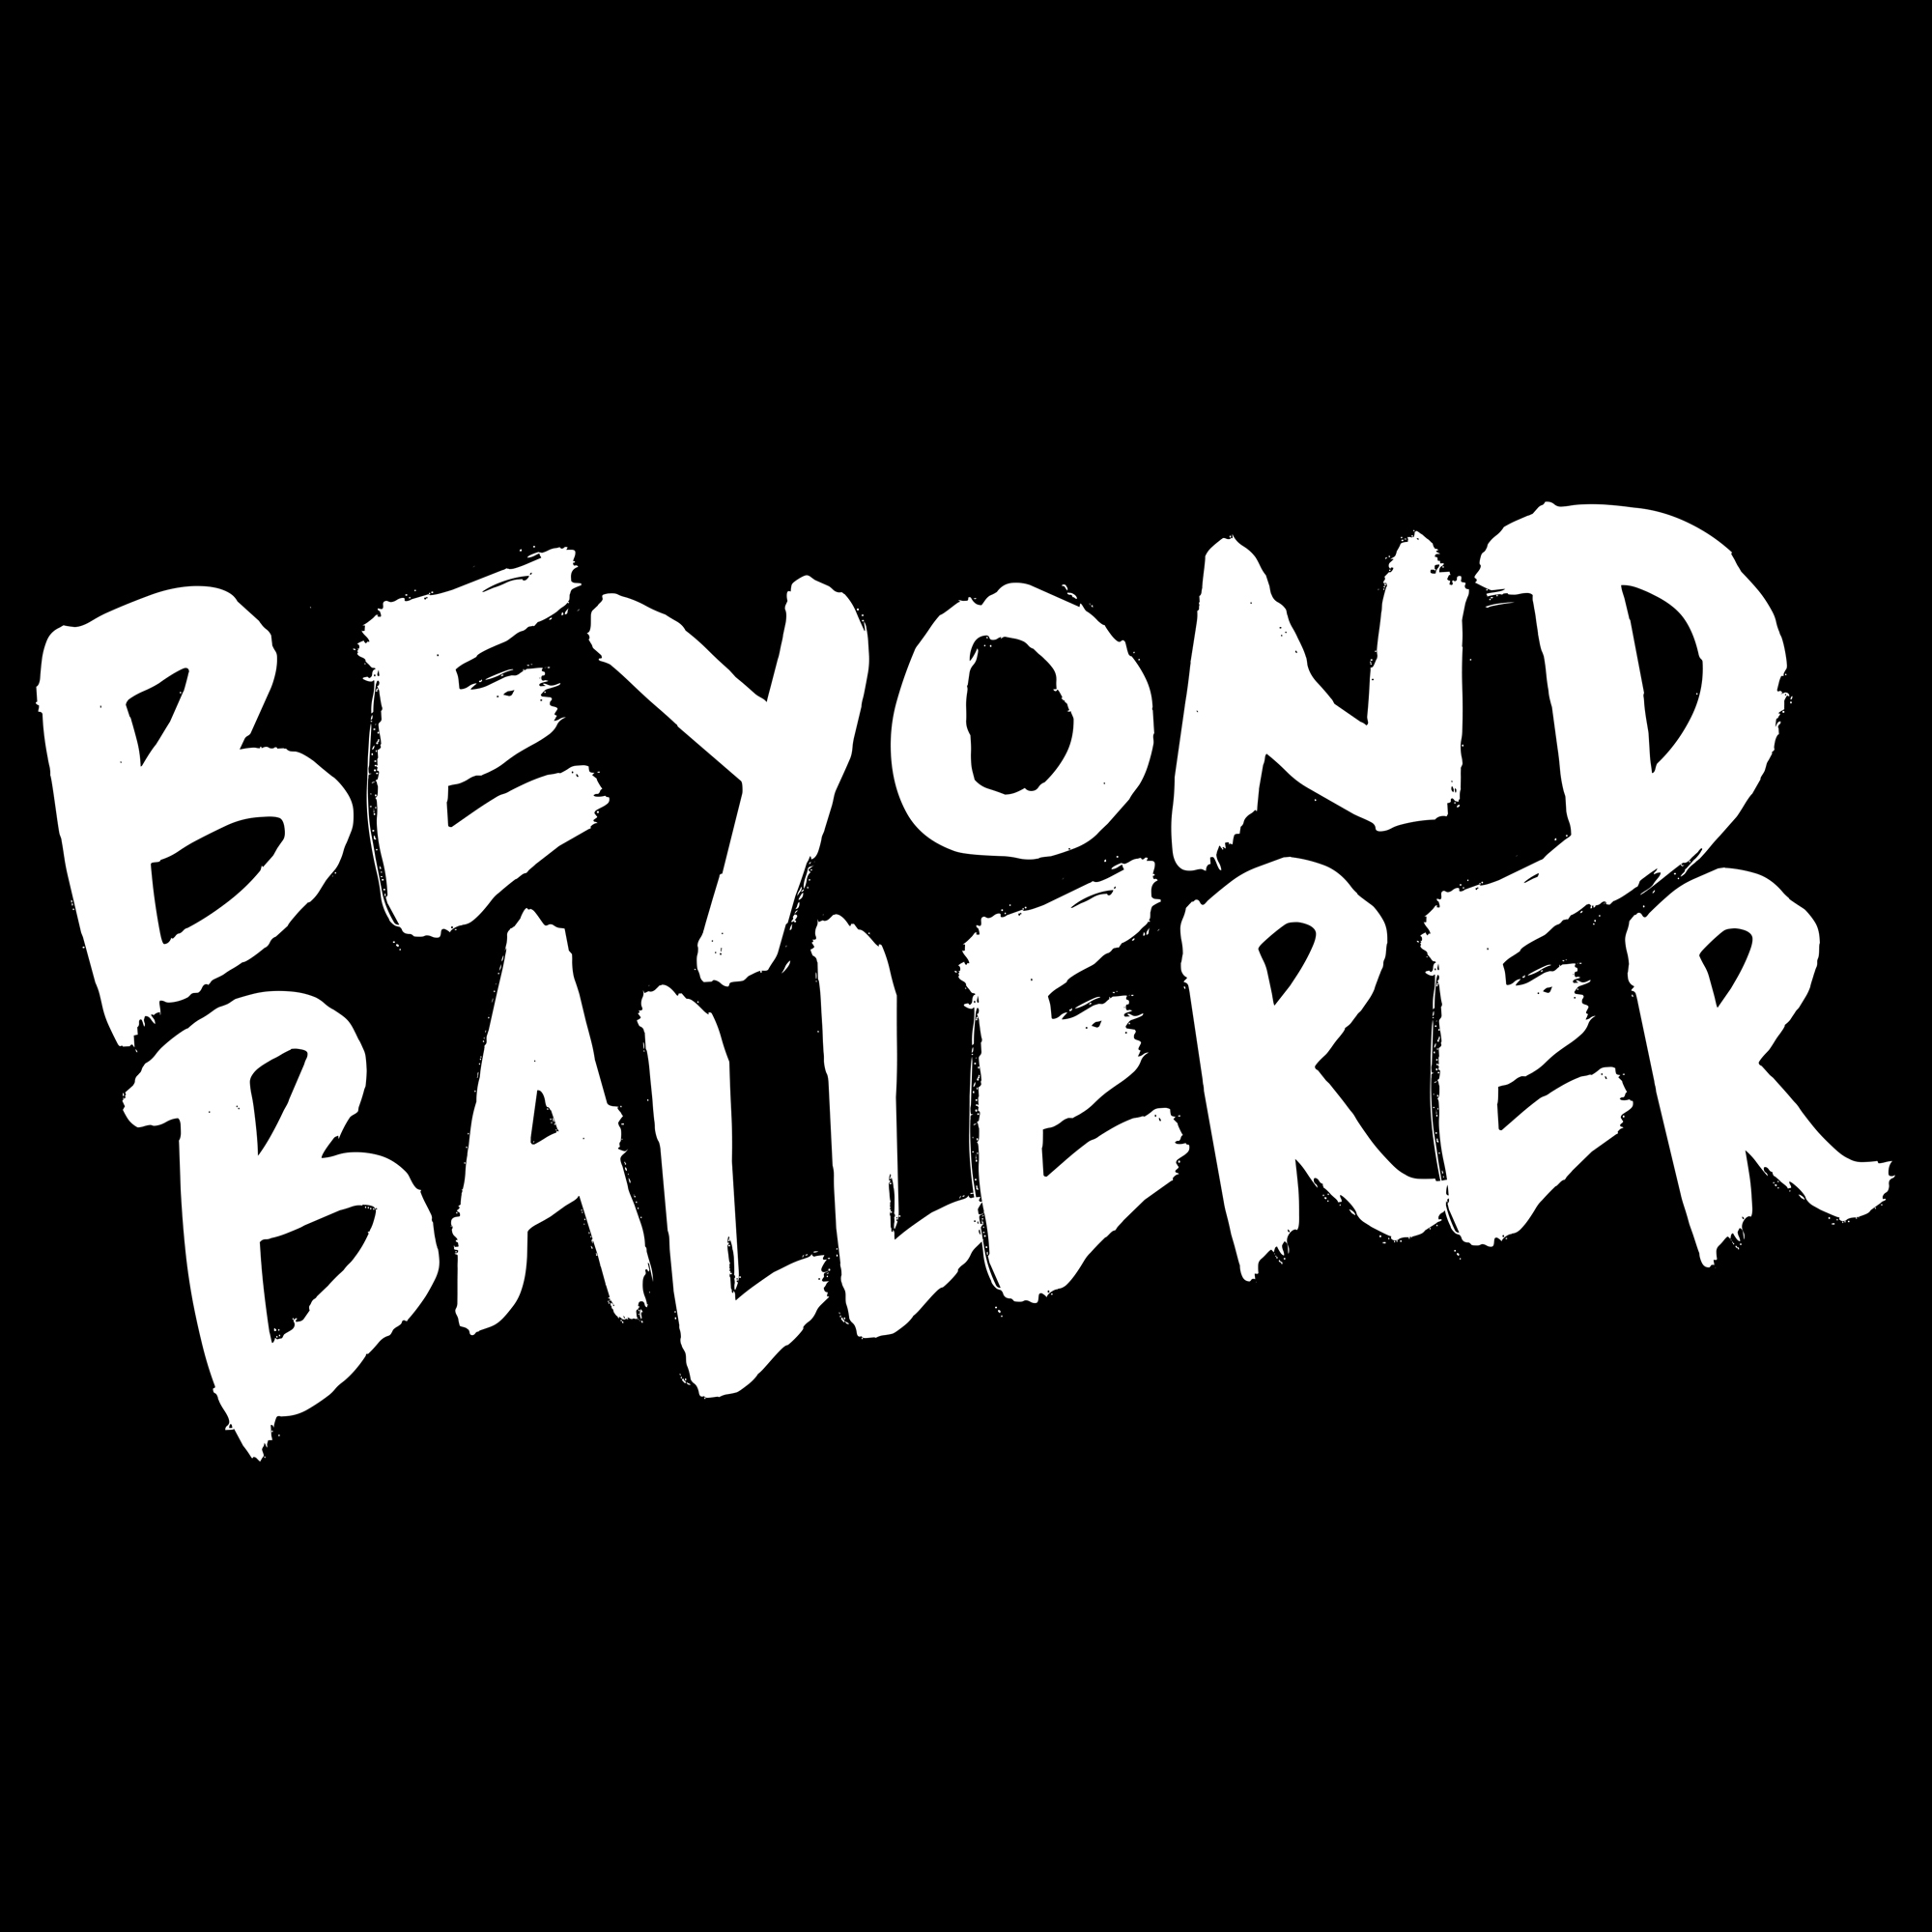 BEYOND BALLERER